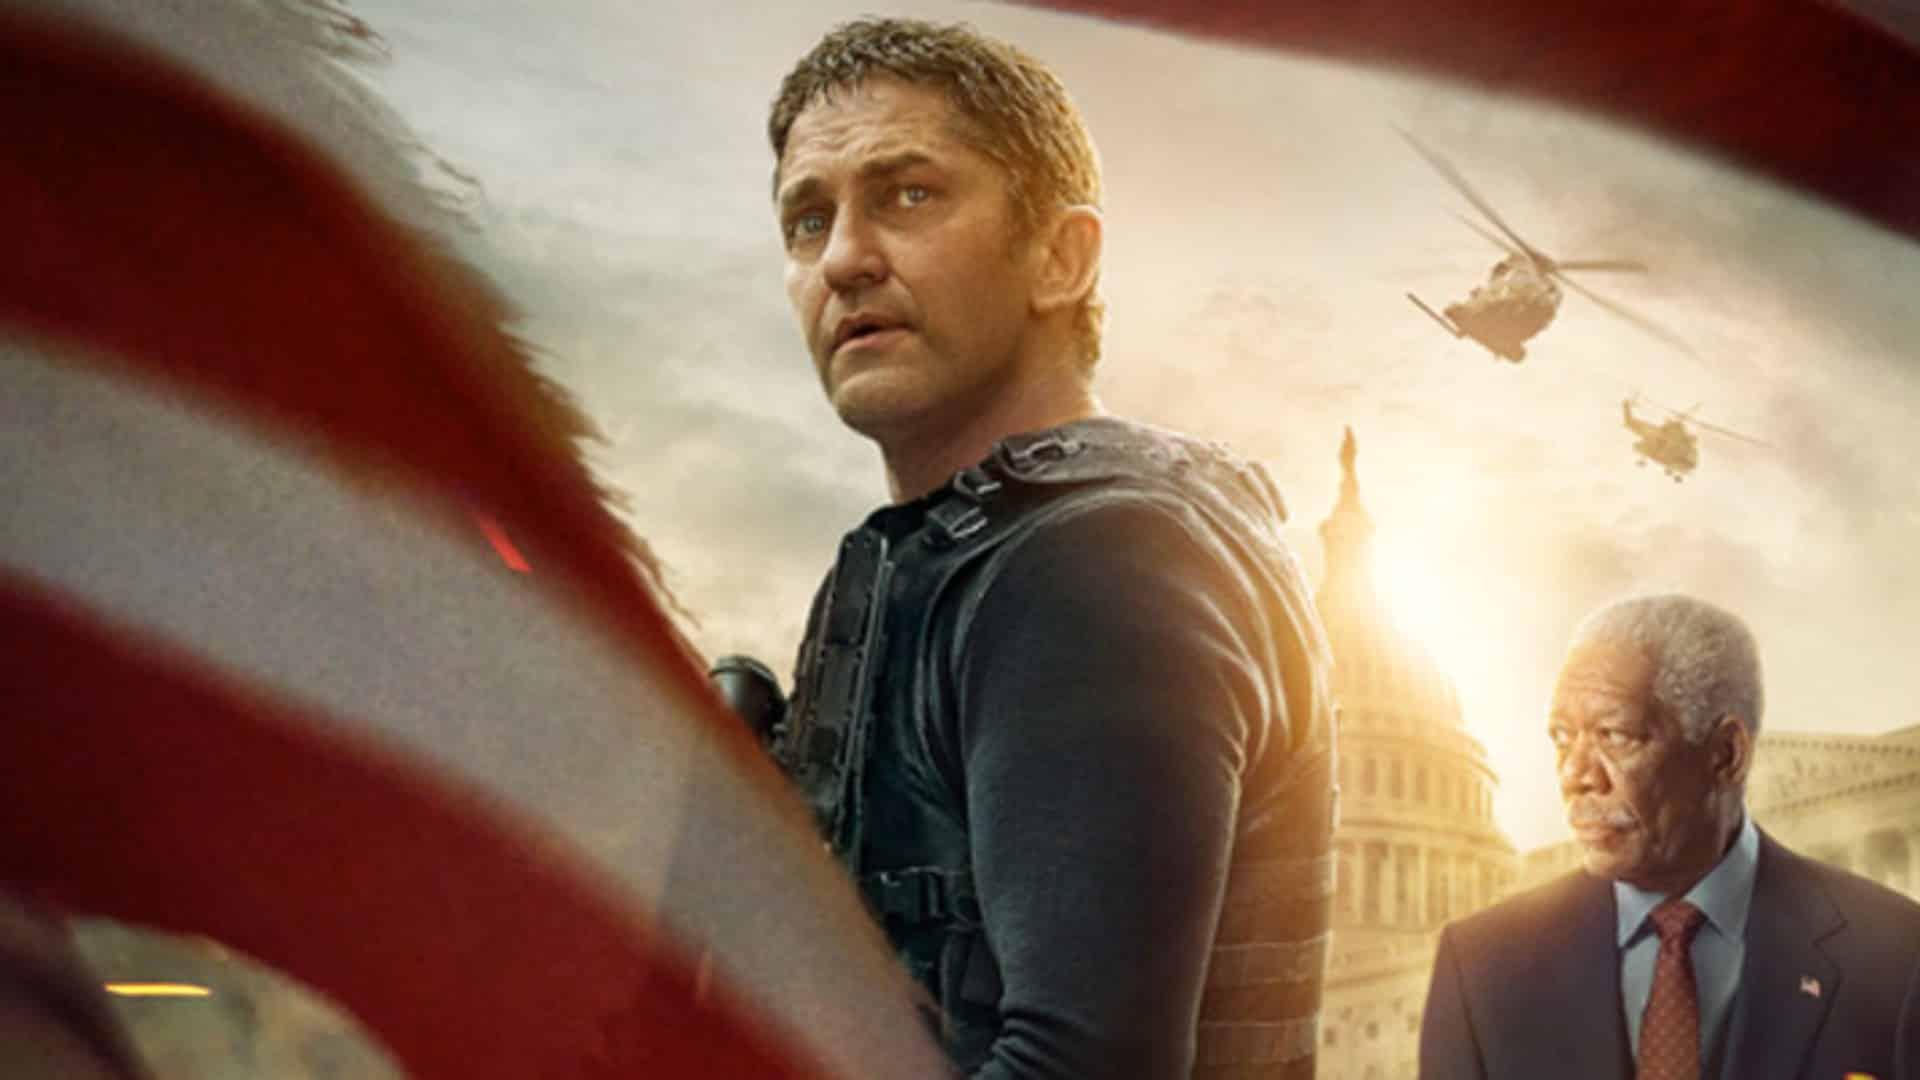 Attacco al potere 3 - Angel Has Fallen - Gerard Butler e Morgan Freeman